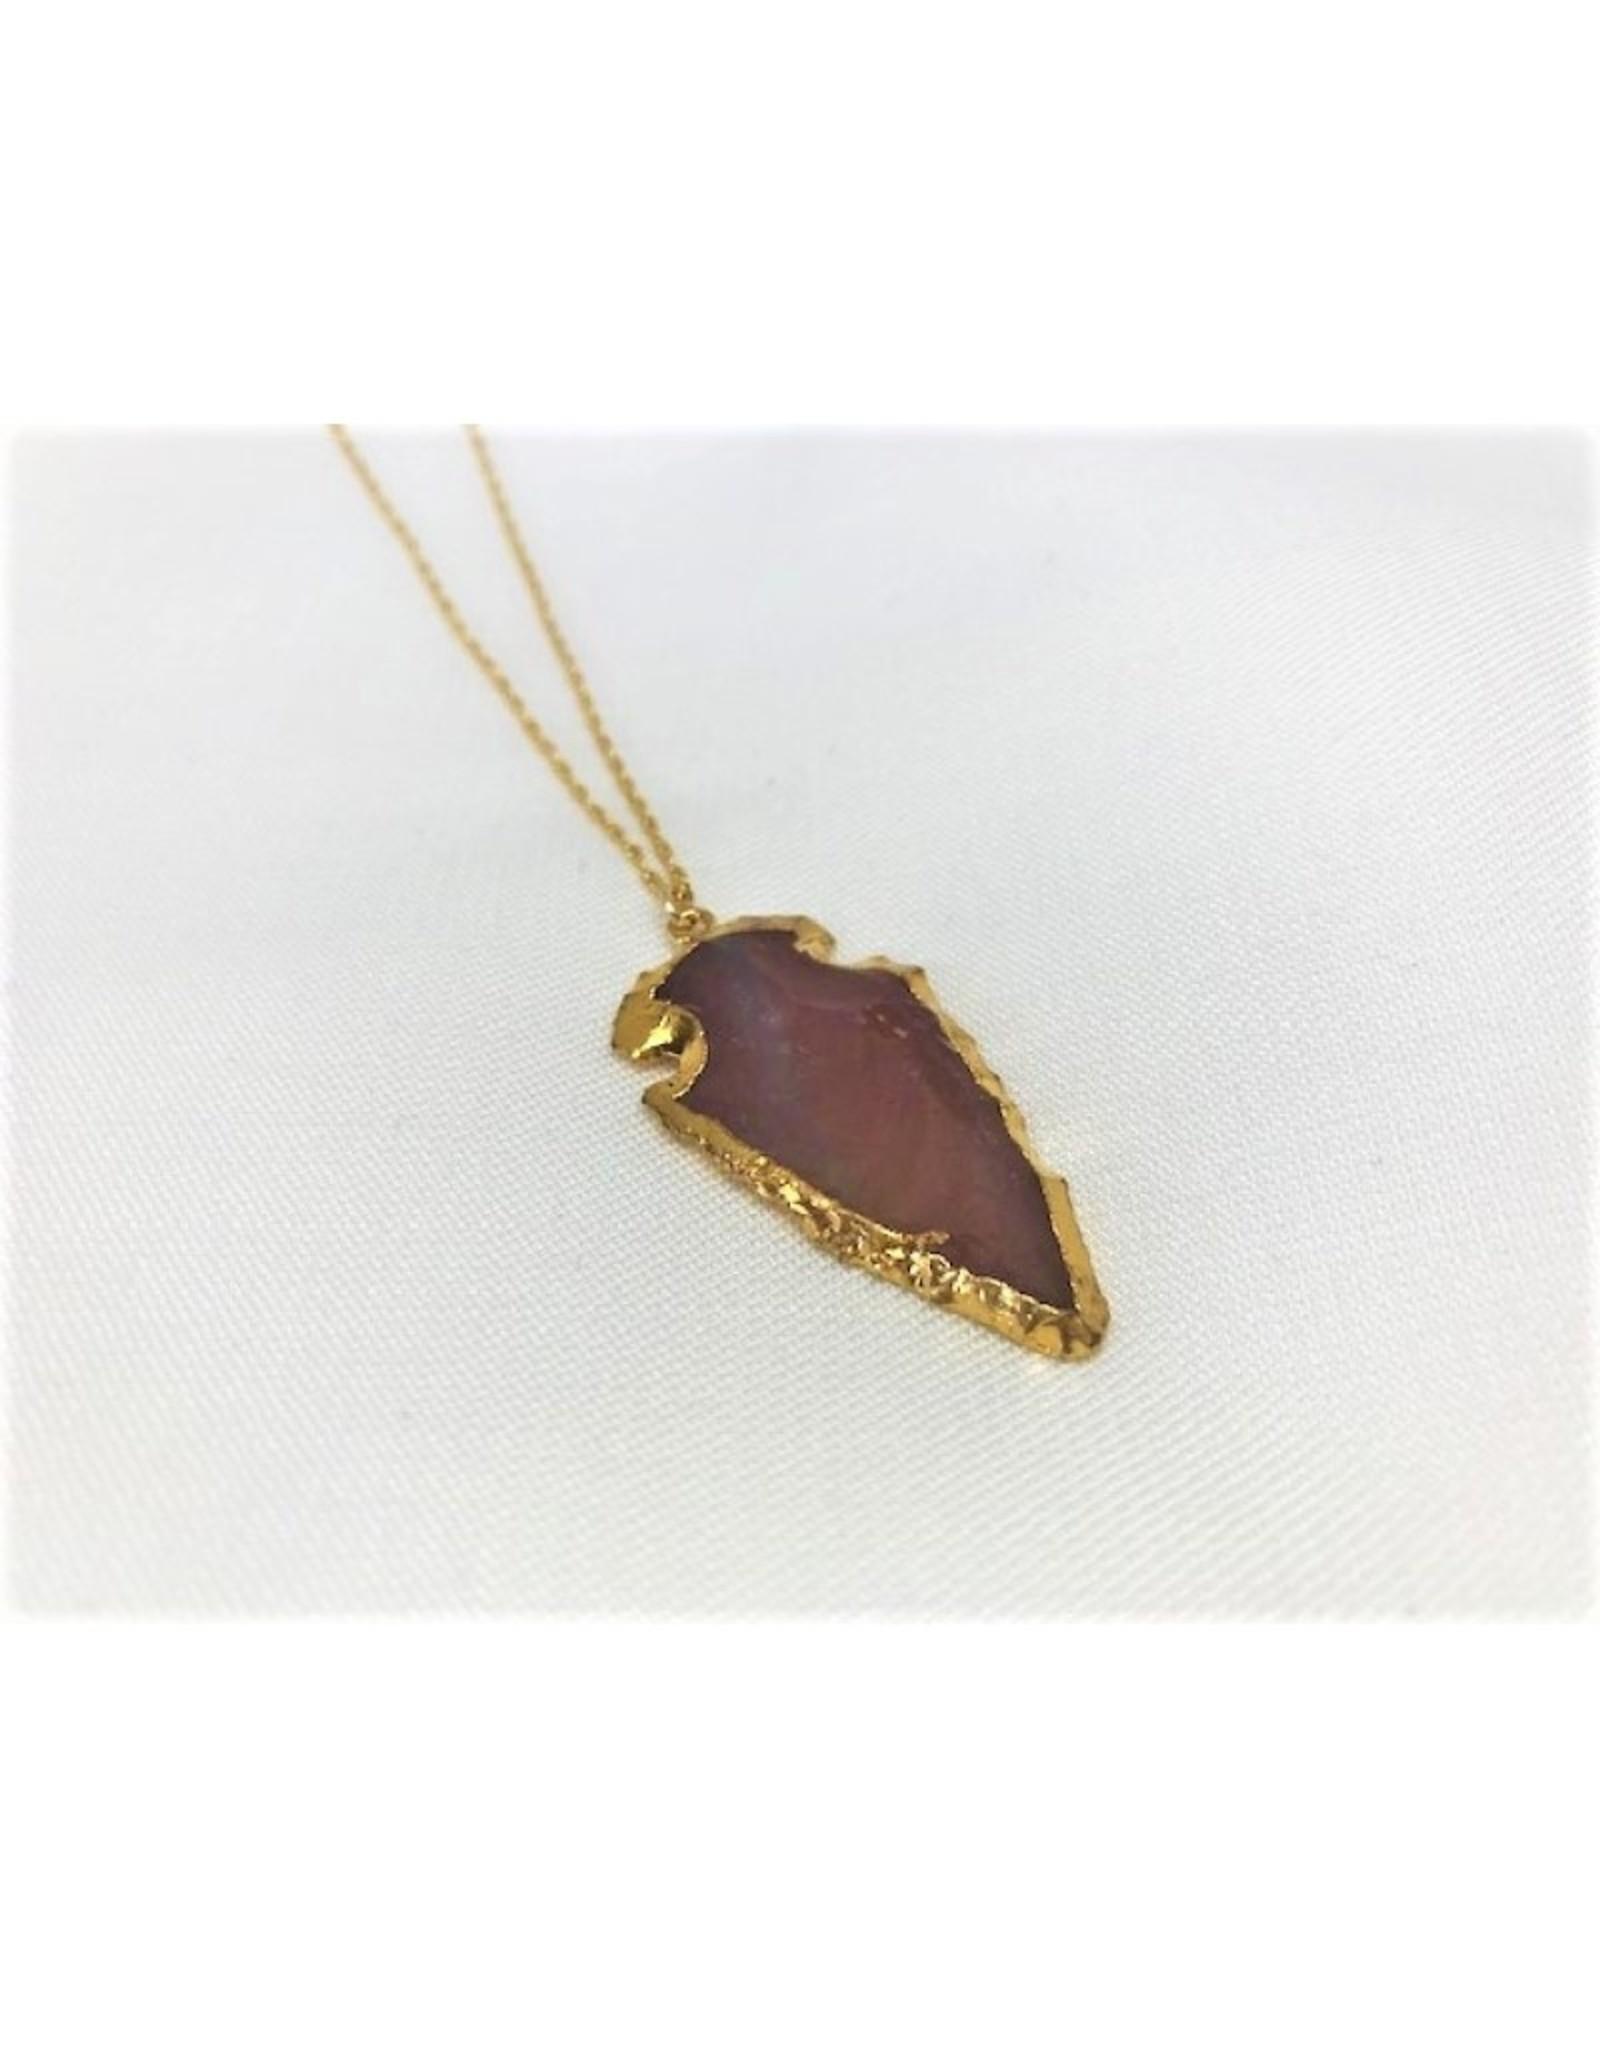 Arrowhead Necklace - Agate/Gold